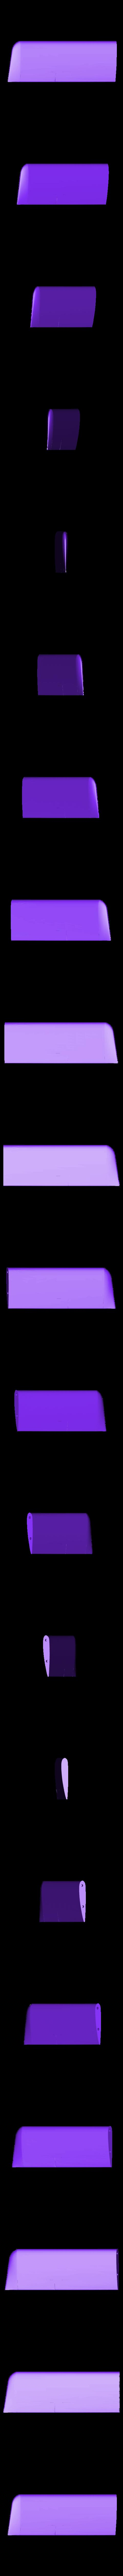 WingLeft.STL Download STL file Vans RV-10 • 3D print template, Eduardohbm